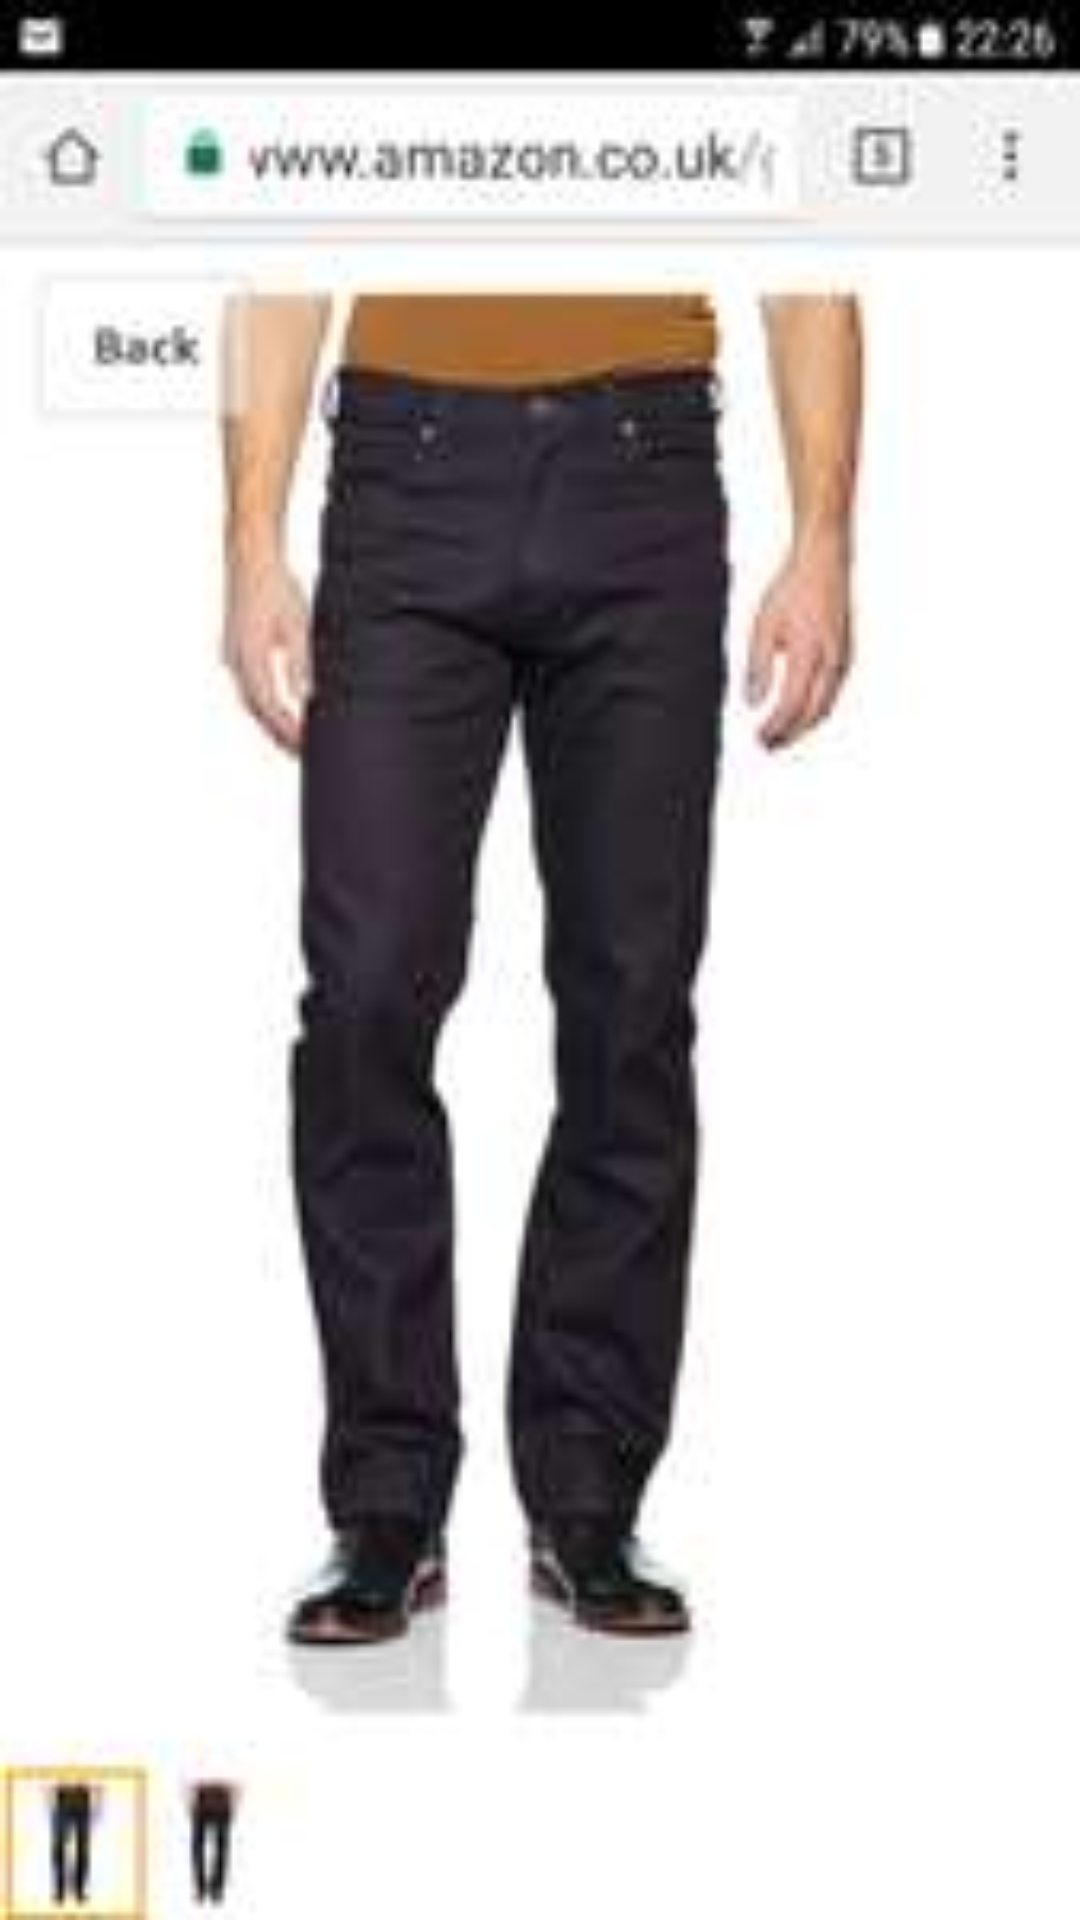 Wrangler Arizona soft hand dark blue Jeans @ Amazon